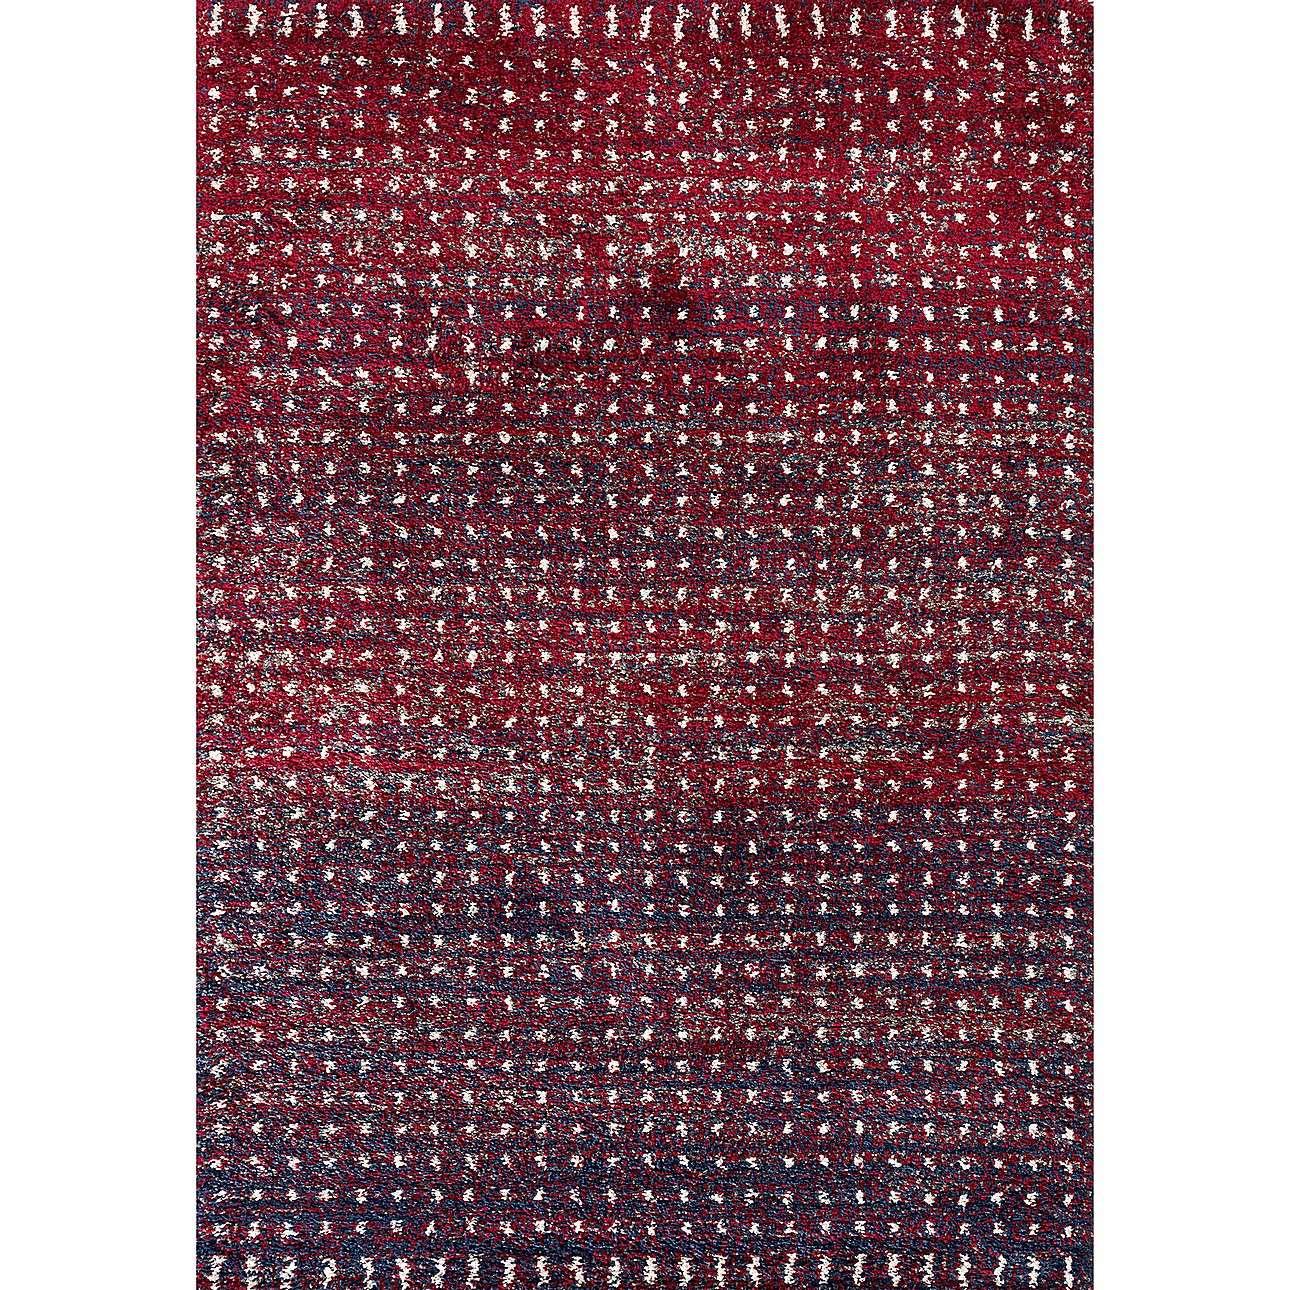 Teppich Royal cherry red/navy 160x230cm